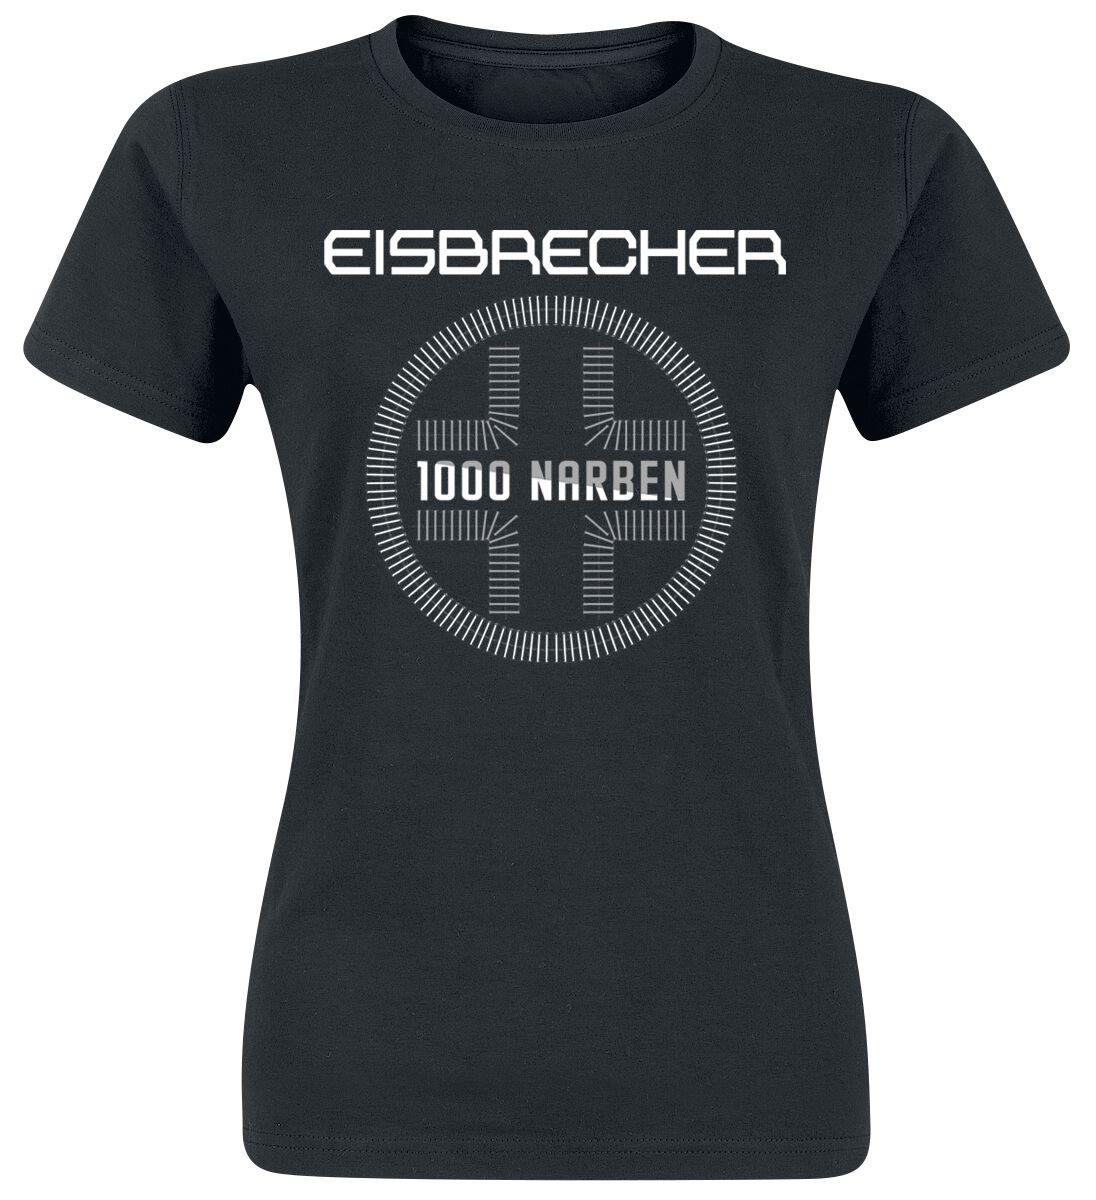 Zespoły - Koszulki - Koszulka damska Eisbrecher 1000 Narben Koszulka damska czarny - 367412